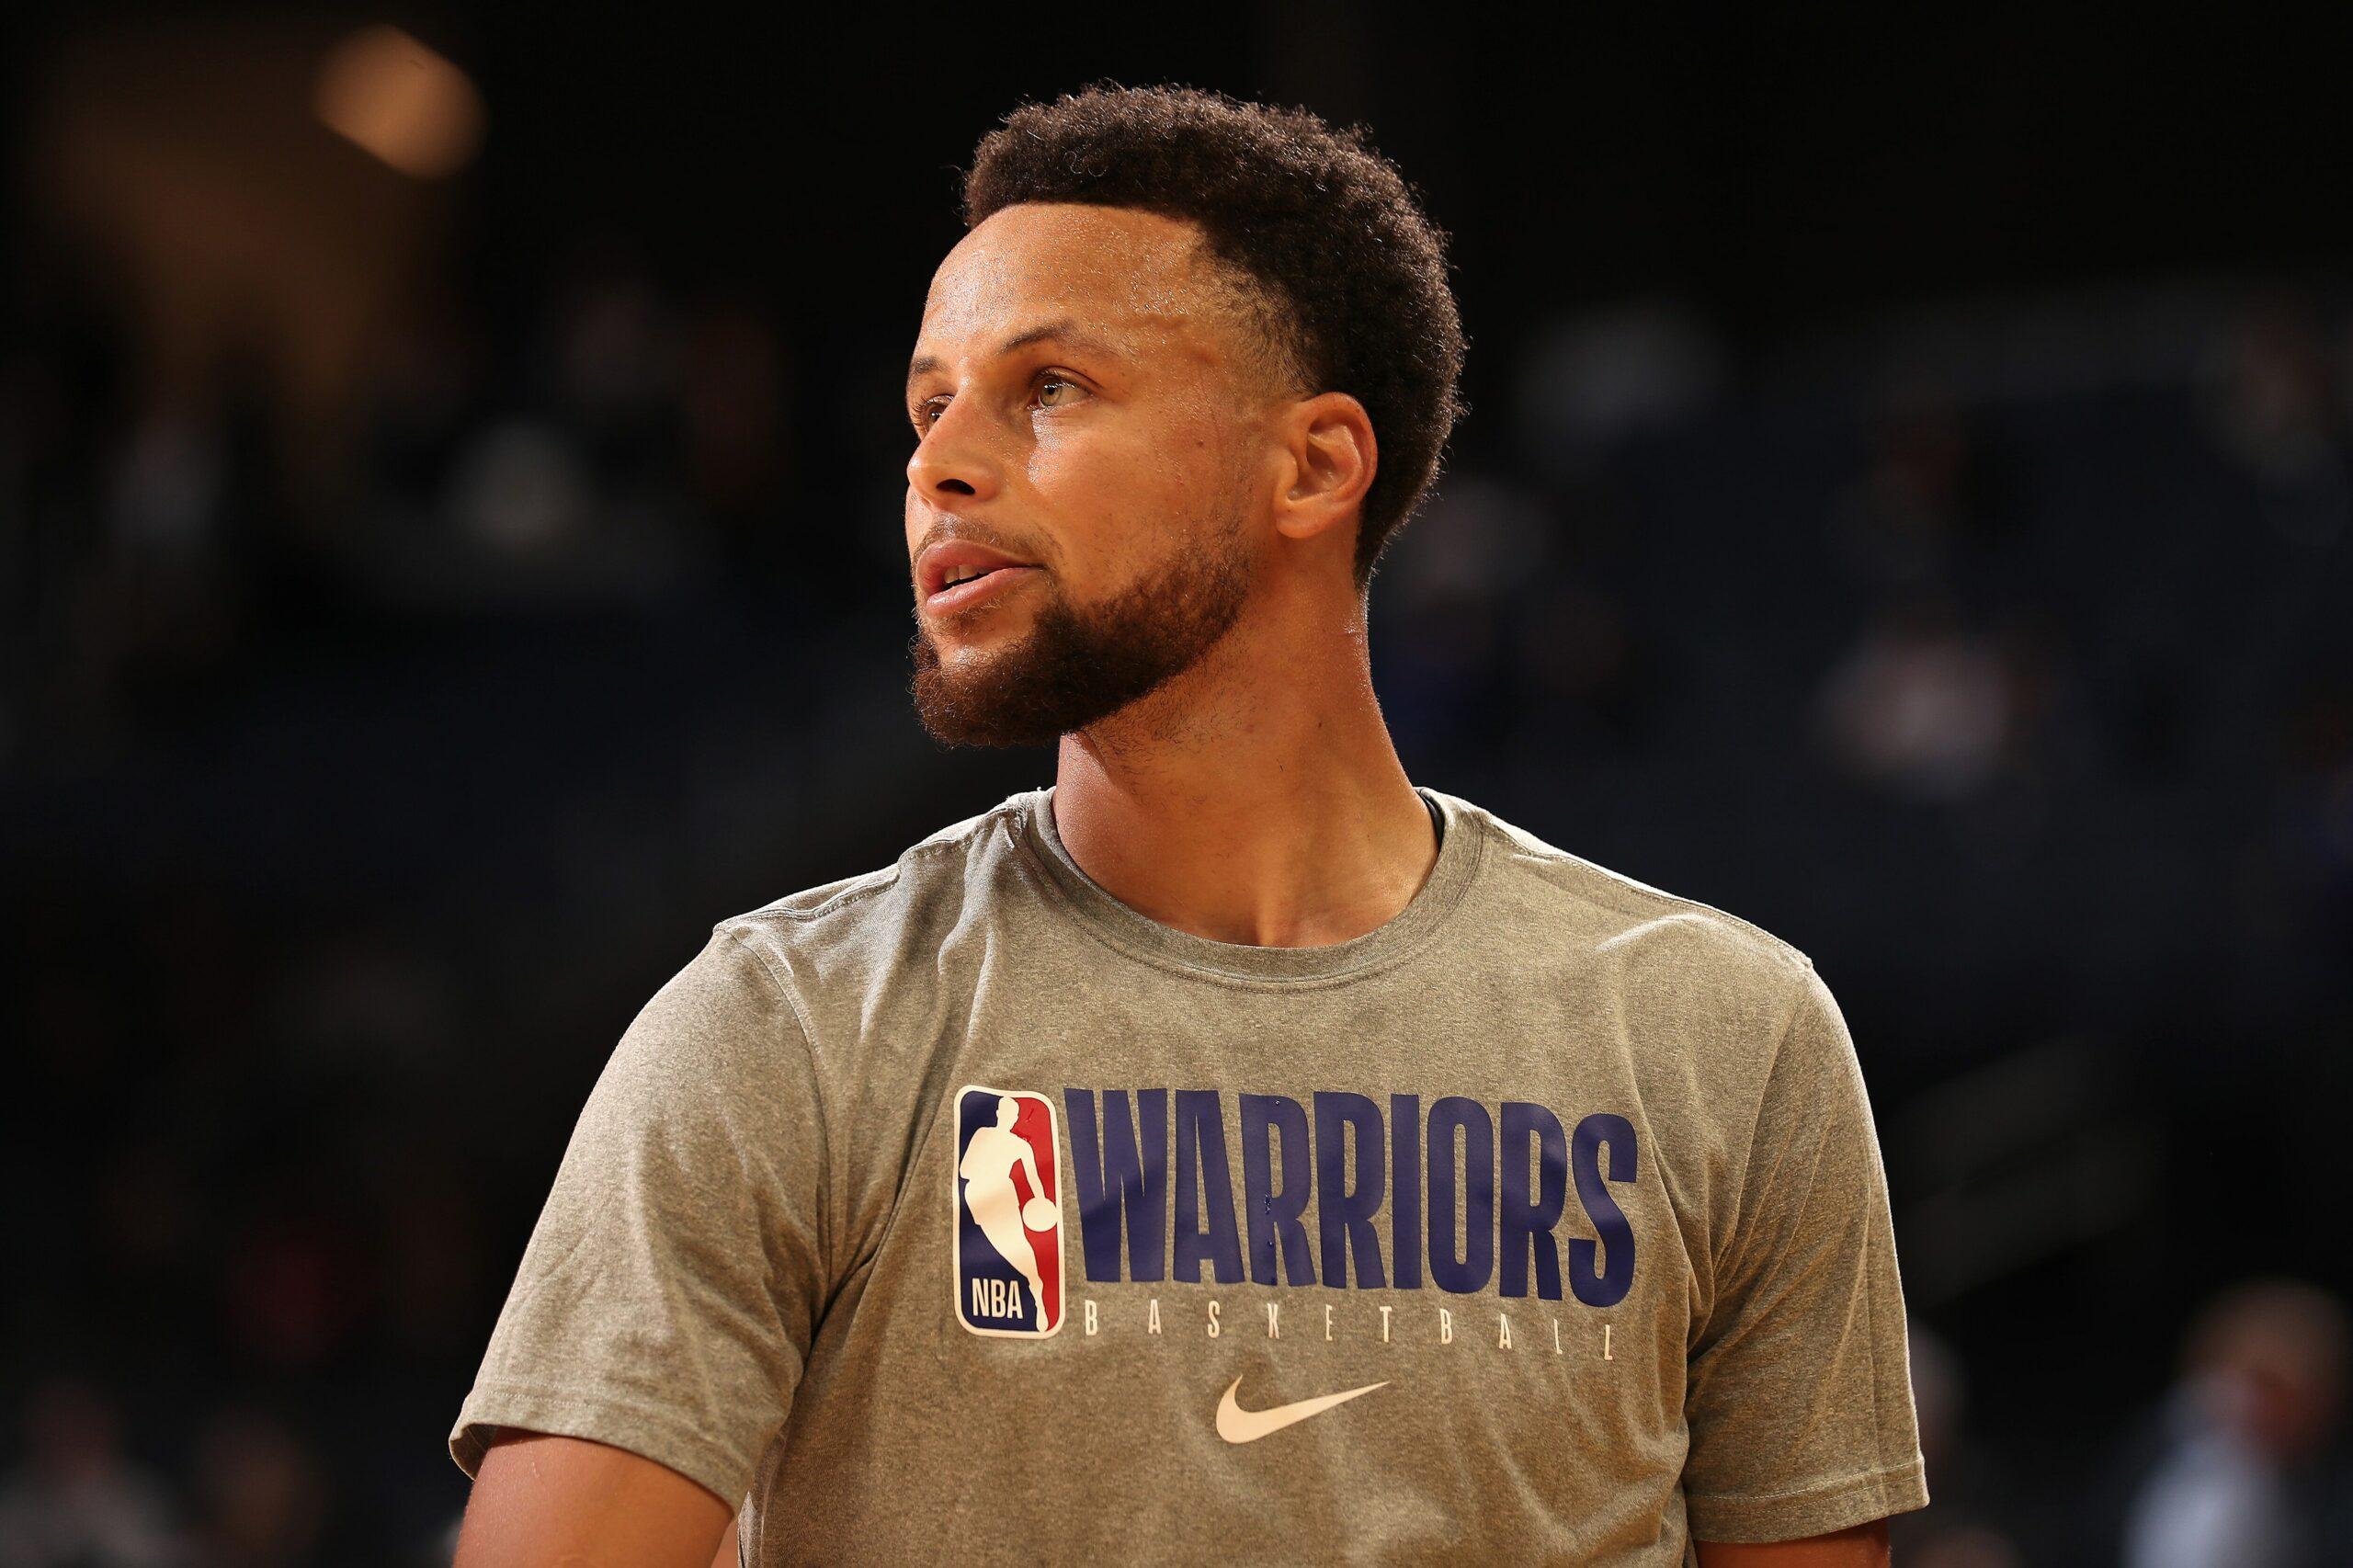 Stephen Curry, WNBA players receive Jackie Robinson award